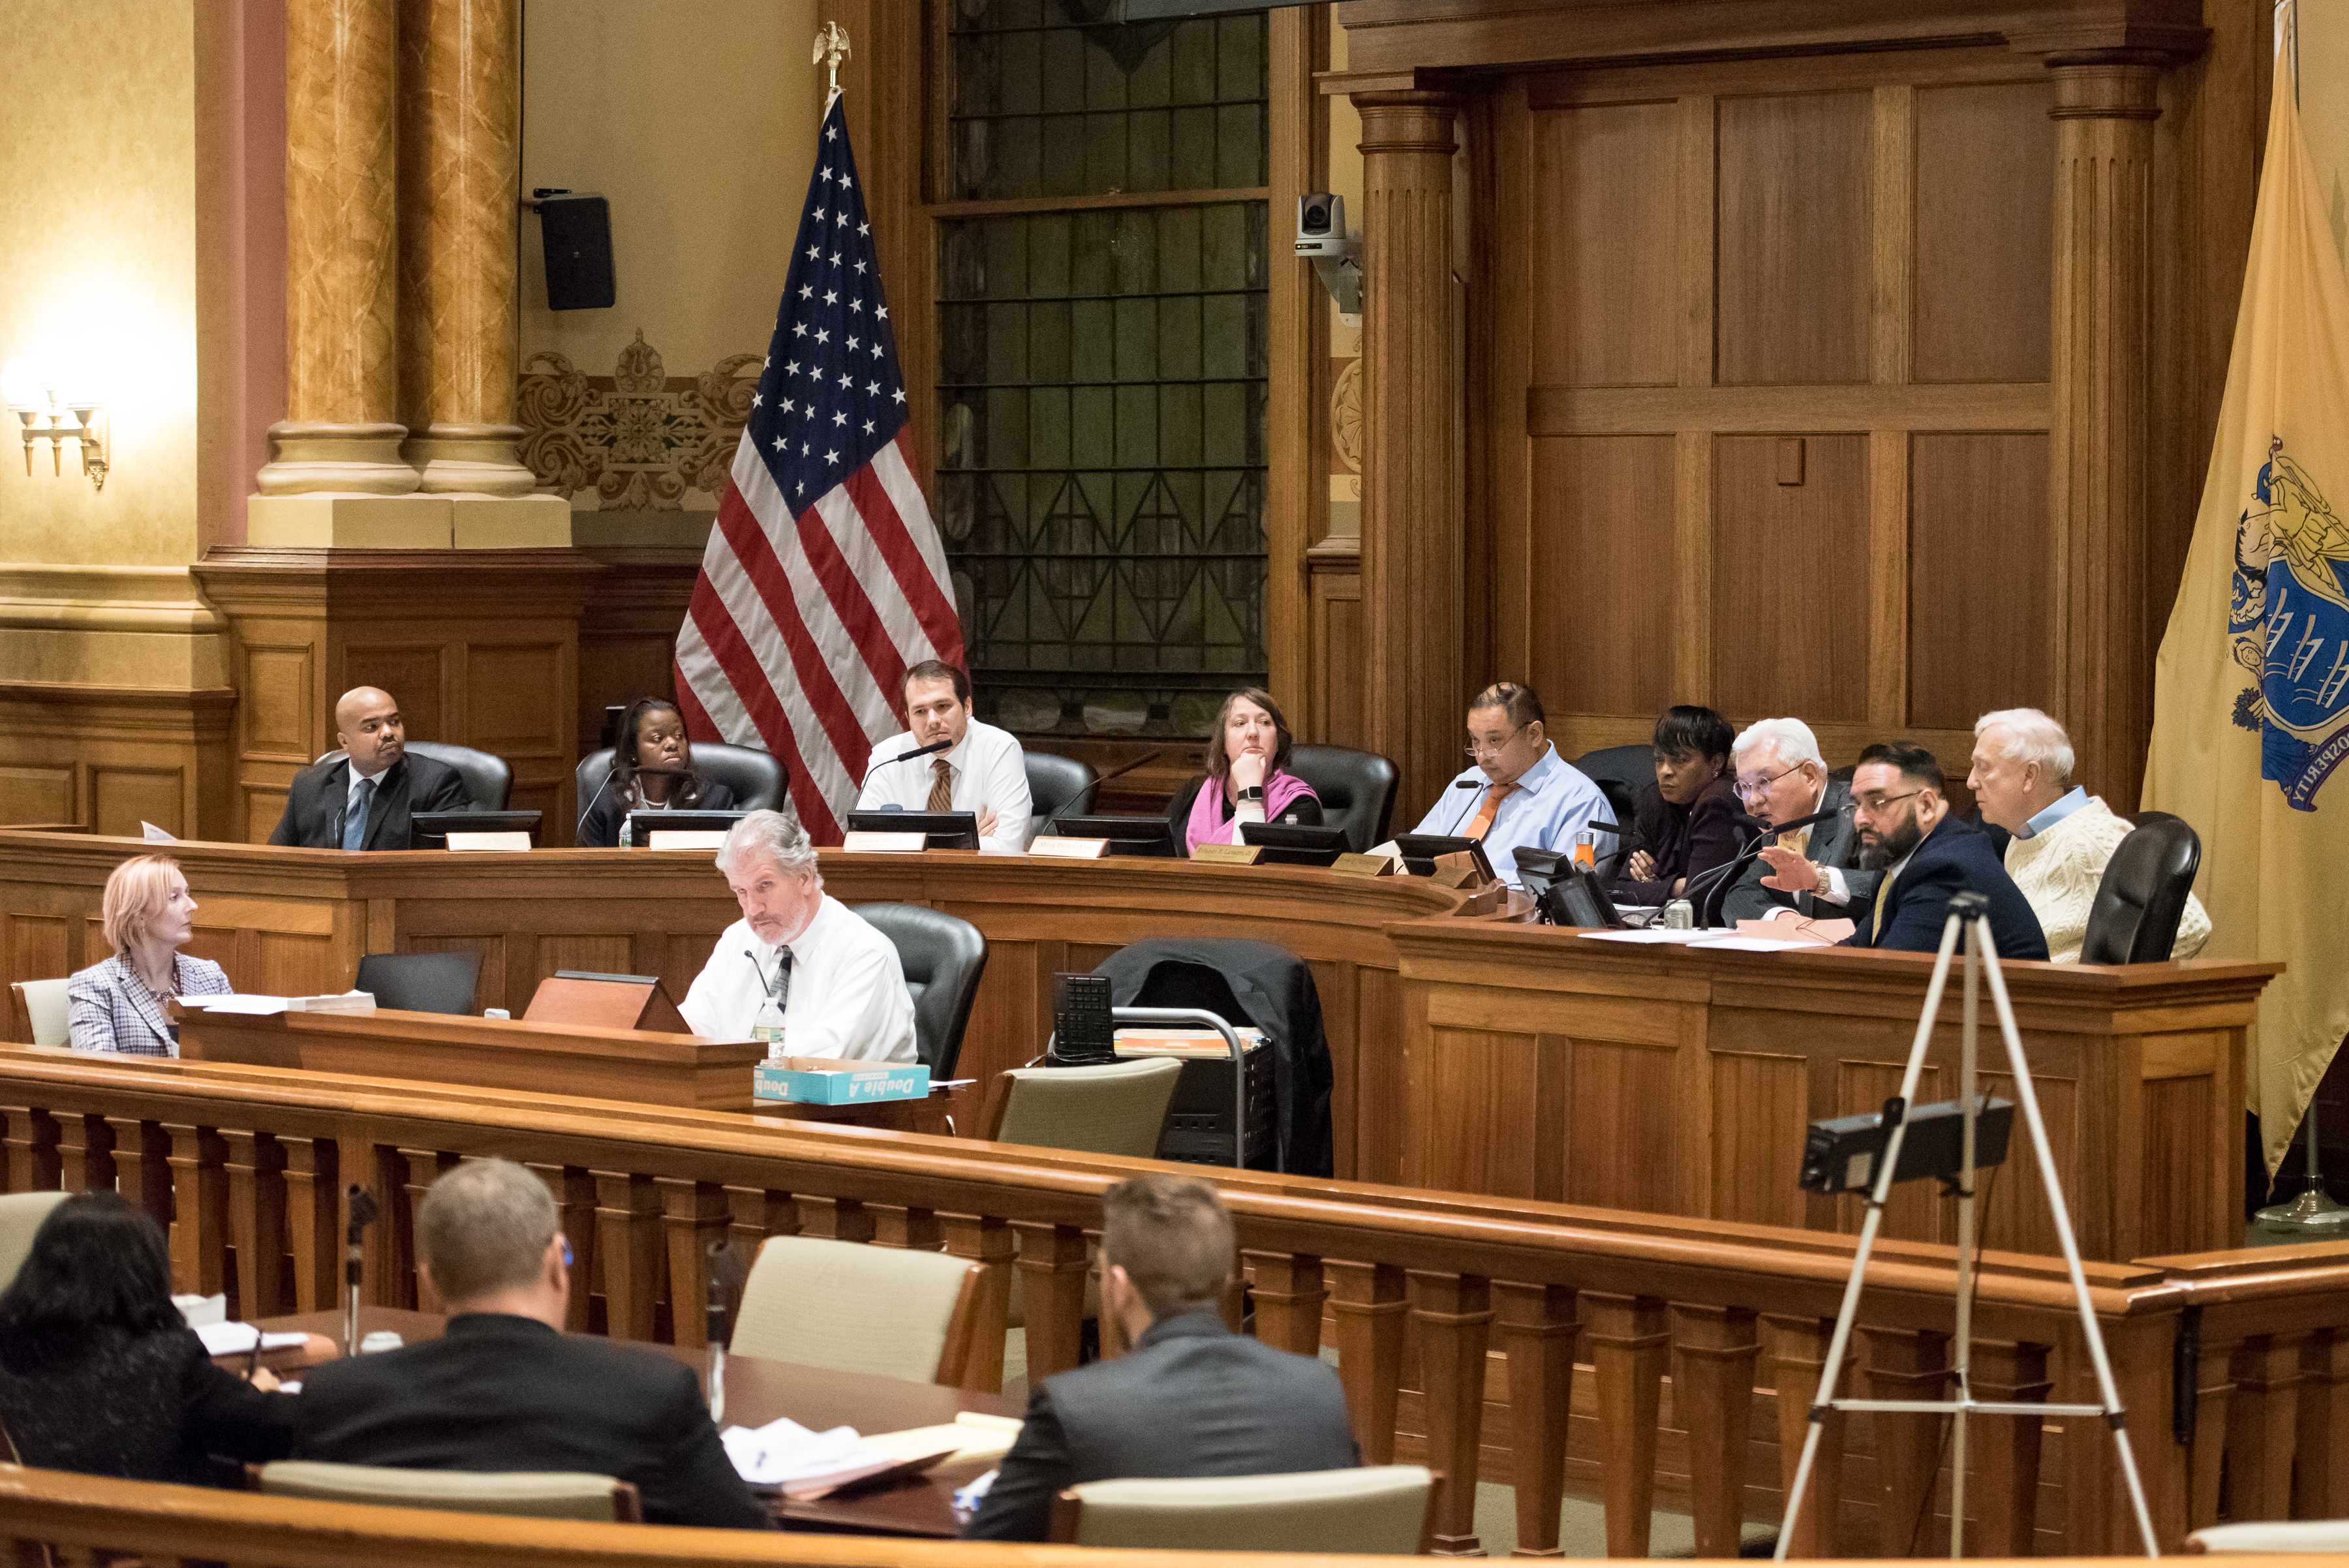 Future Jersey City tax abatements will add to school funding